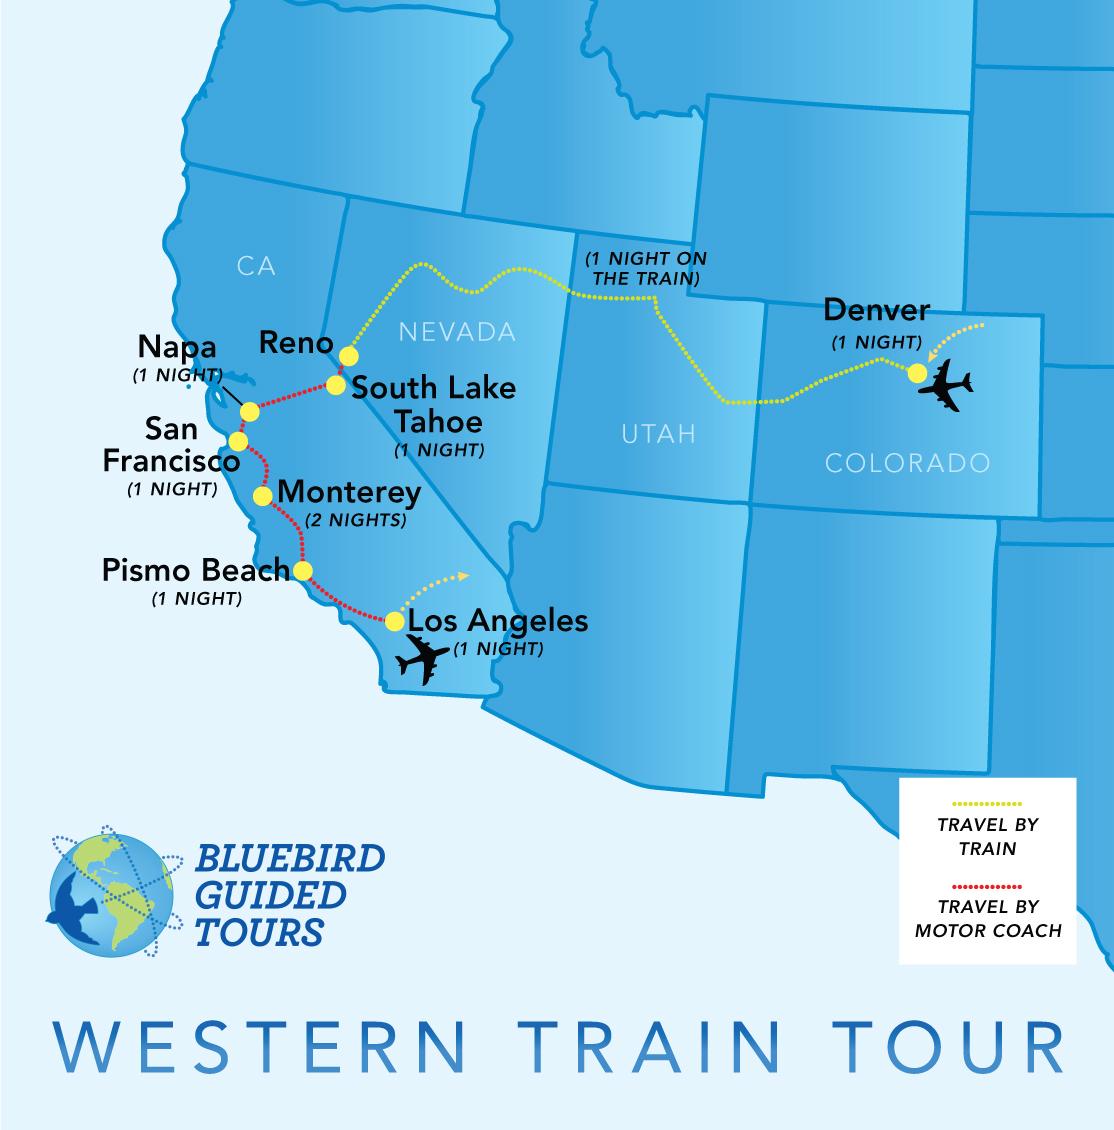 BGT_WesternTrainTour_MAP.jpg